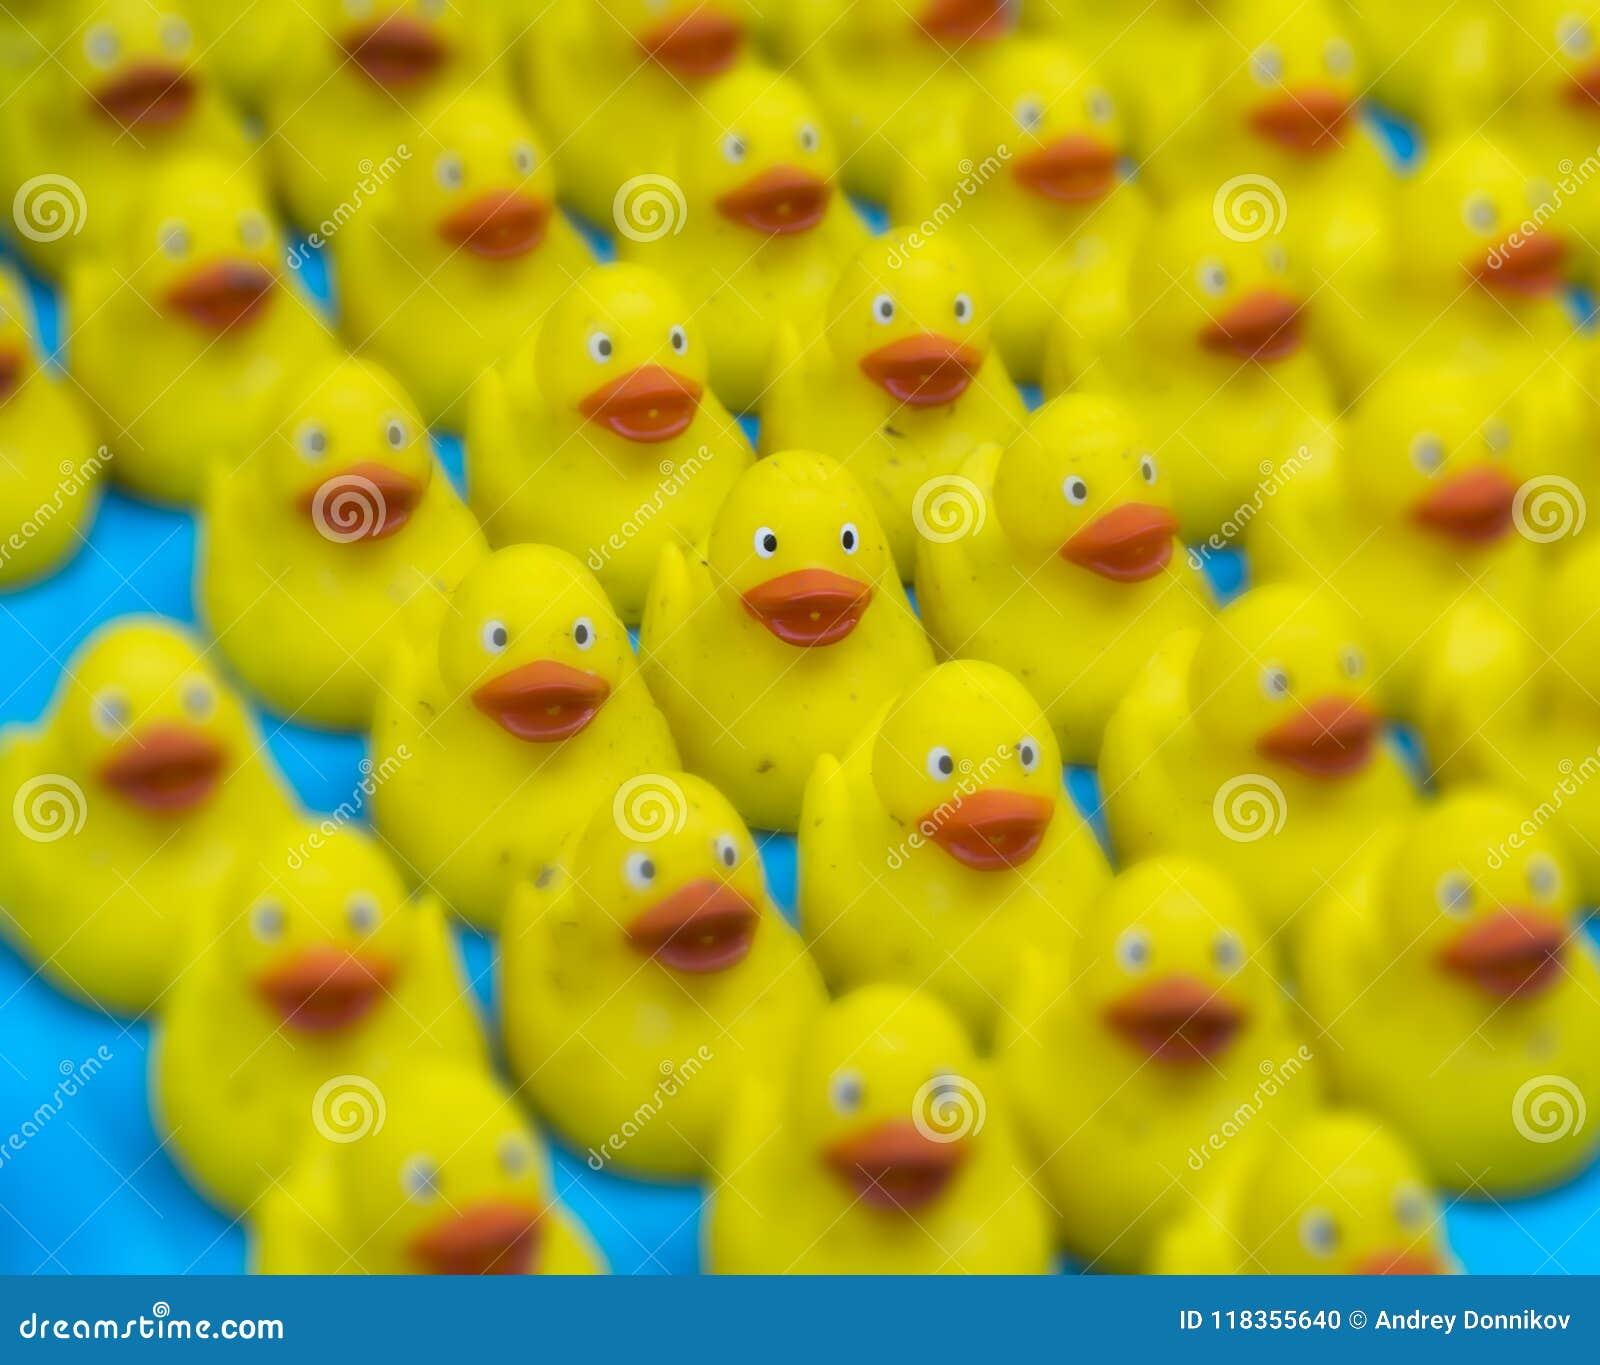 Viel Ducky Toy Little Yellow Rubber Duck-Bad-Spielzeug Selektiver Fokus